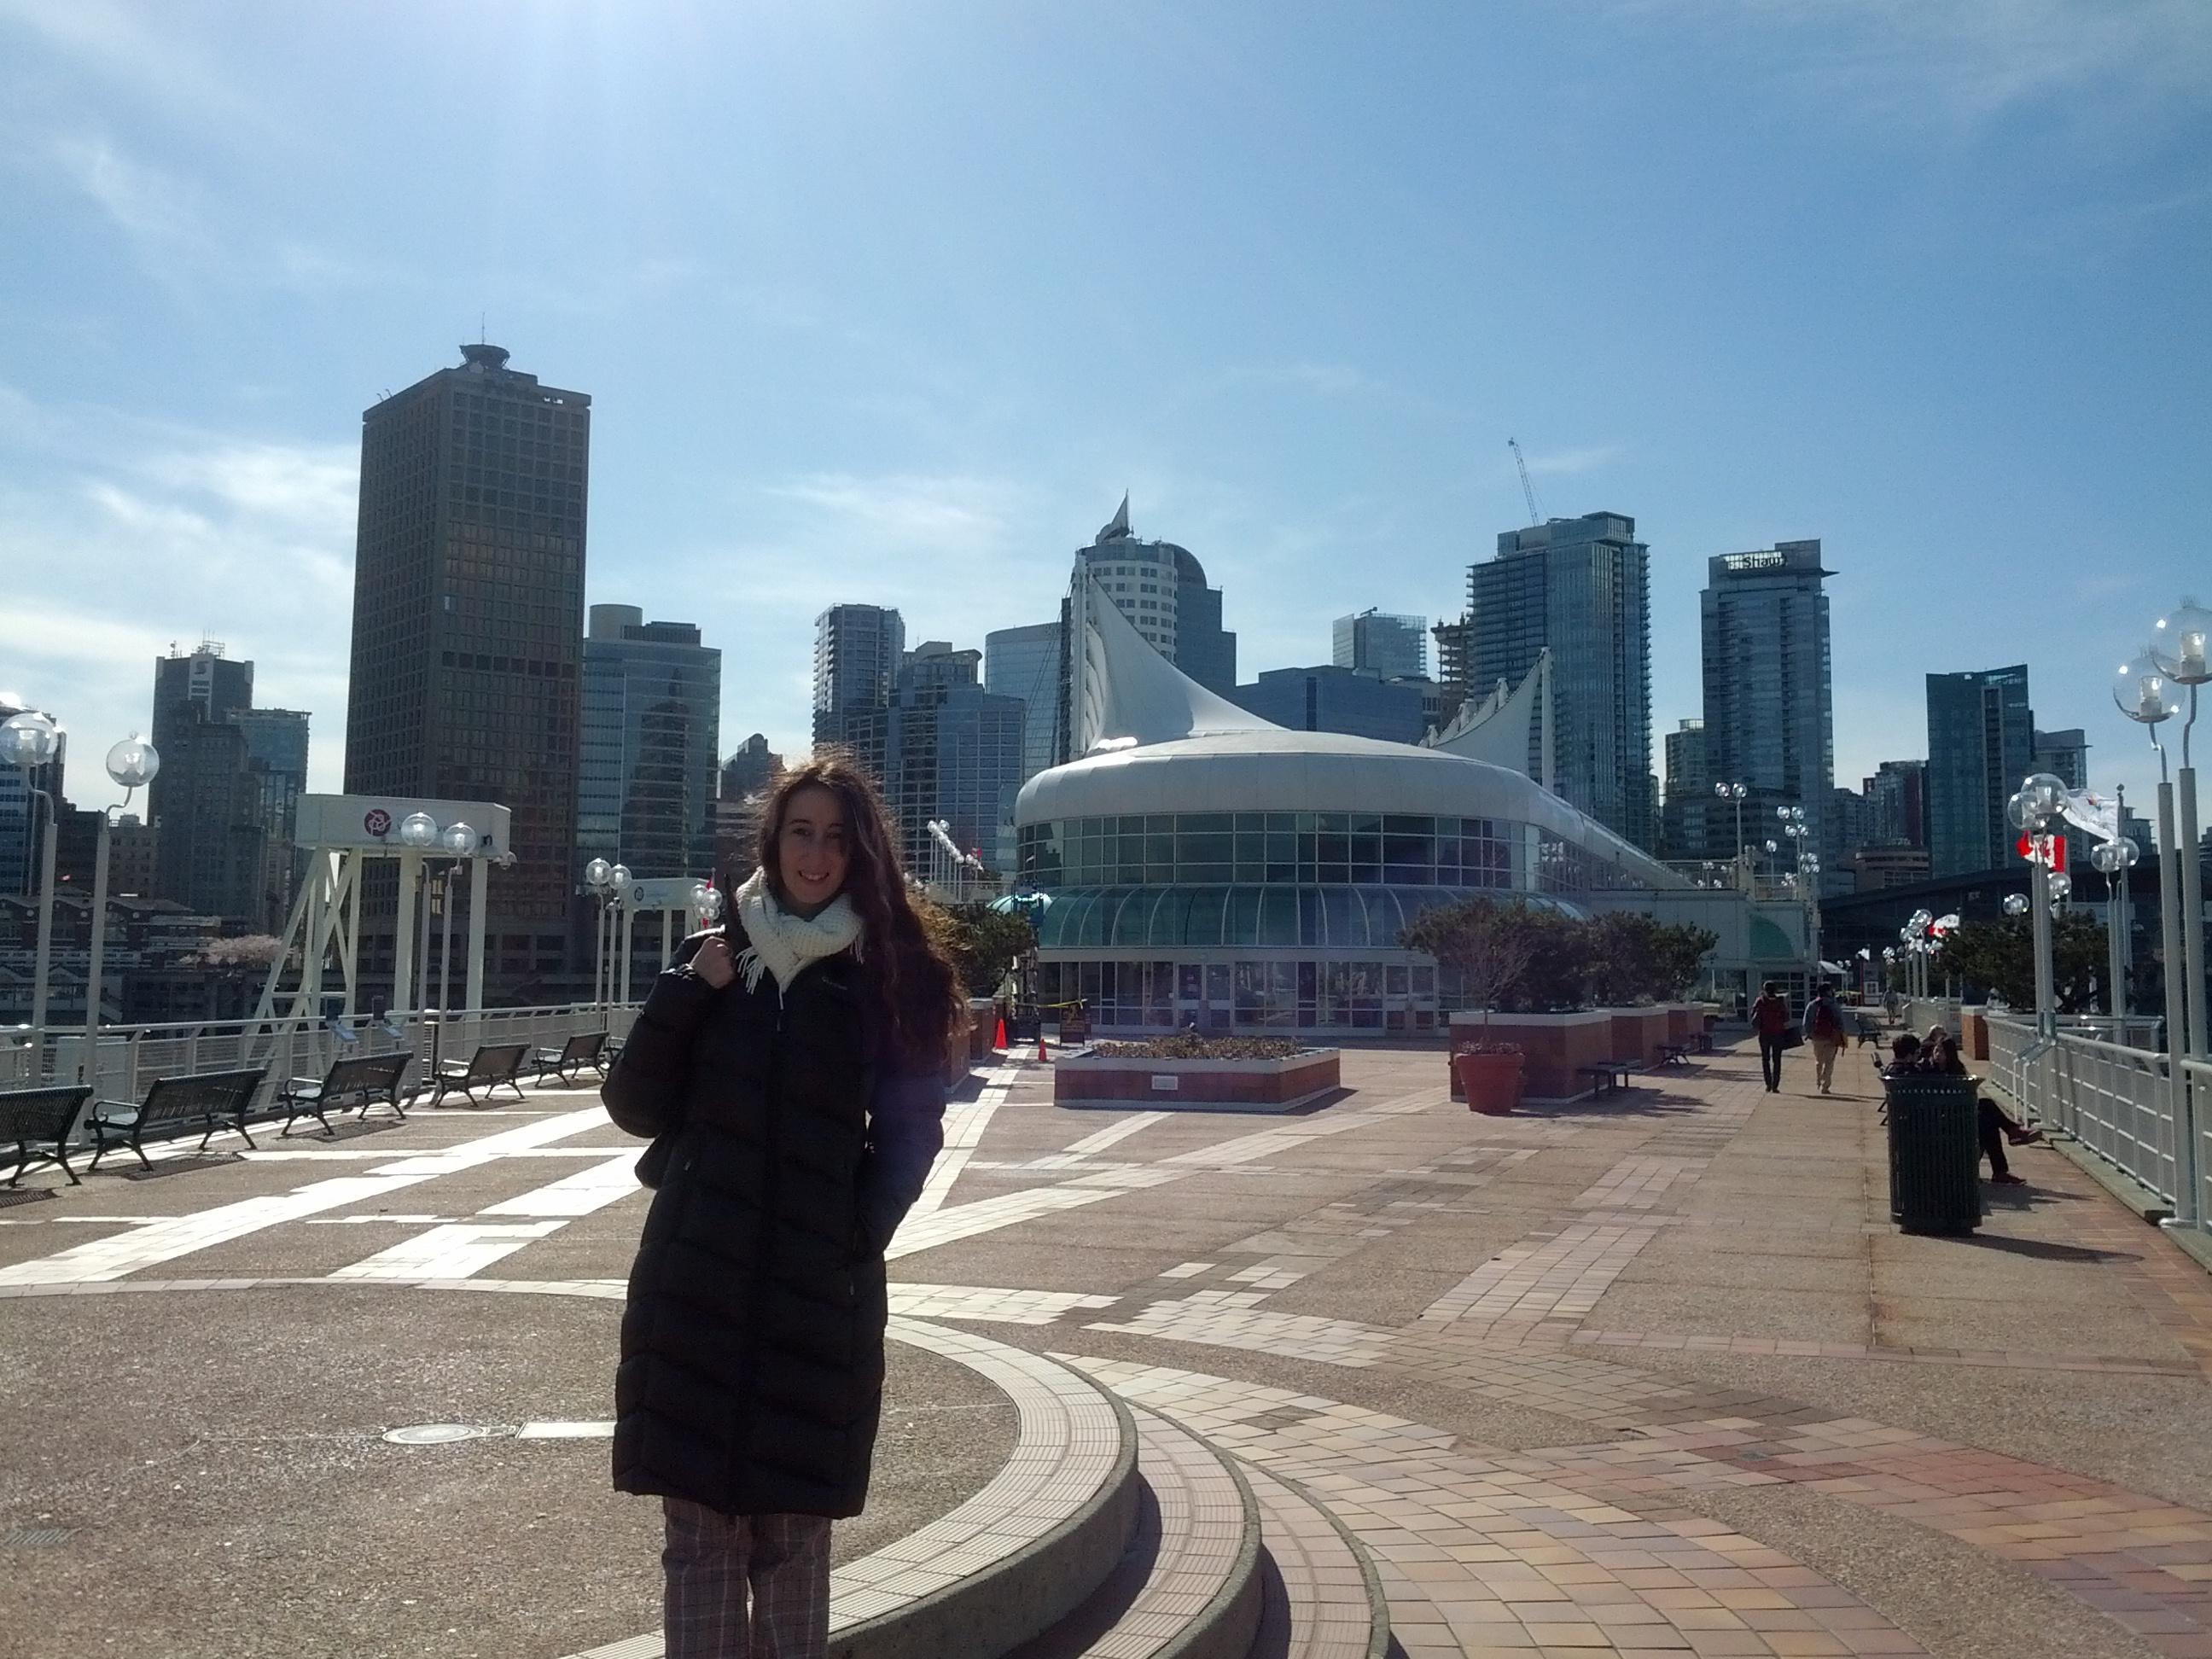 Working Holiday Visa Canada - Guida preliminare